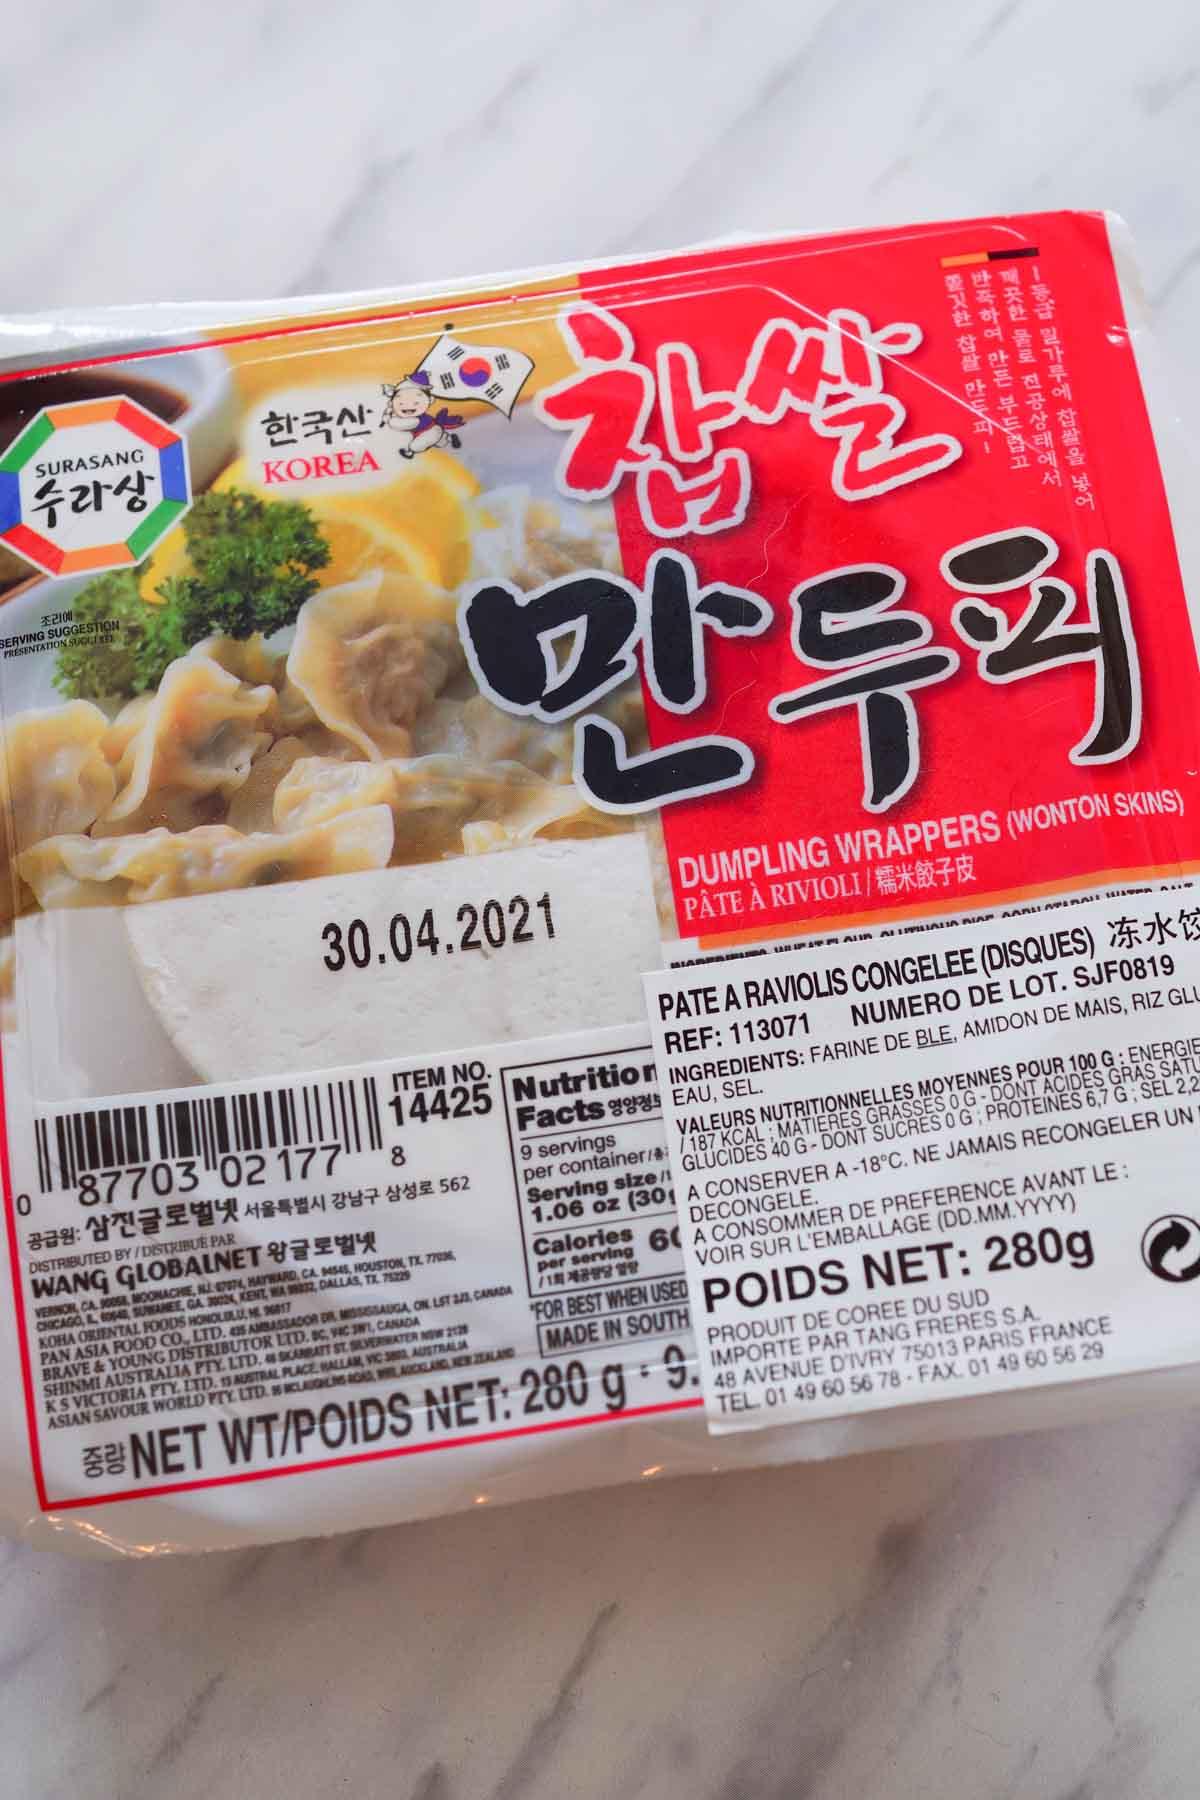 A package of Korean dumpling wrappers.